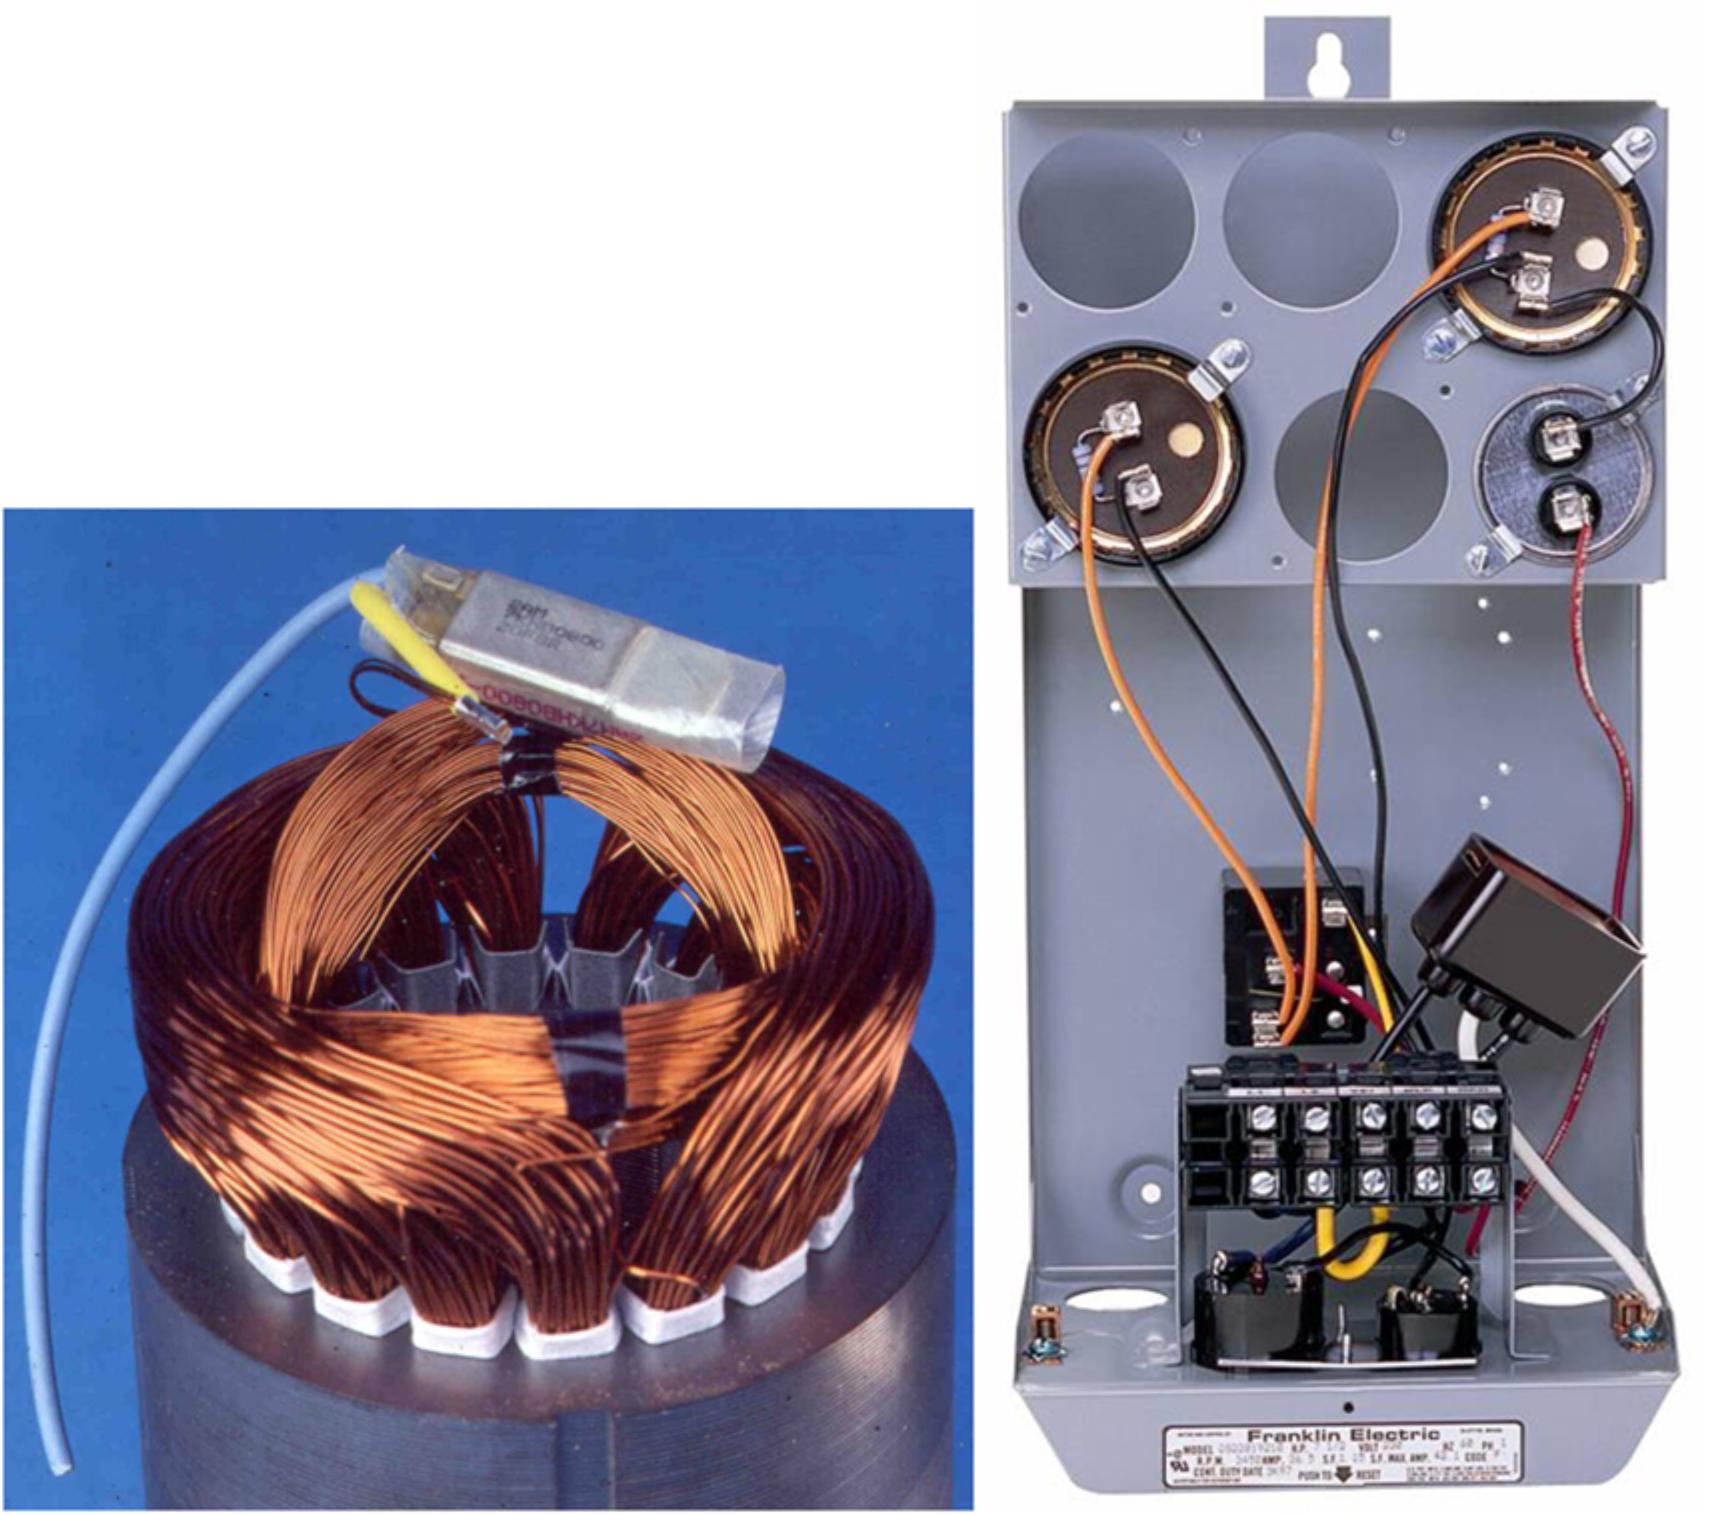 Pool Pump 230 Volt Wiring Diagram Franklin Electric Submersible Pump